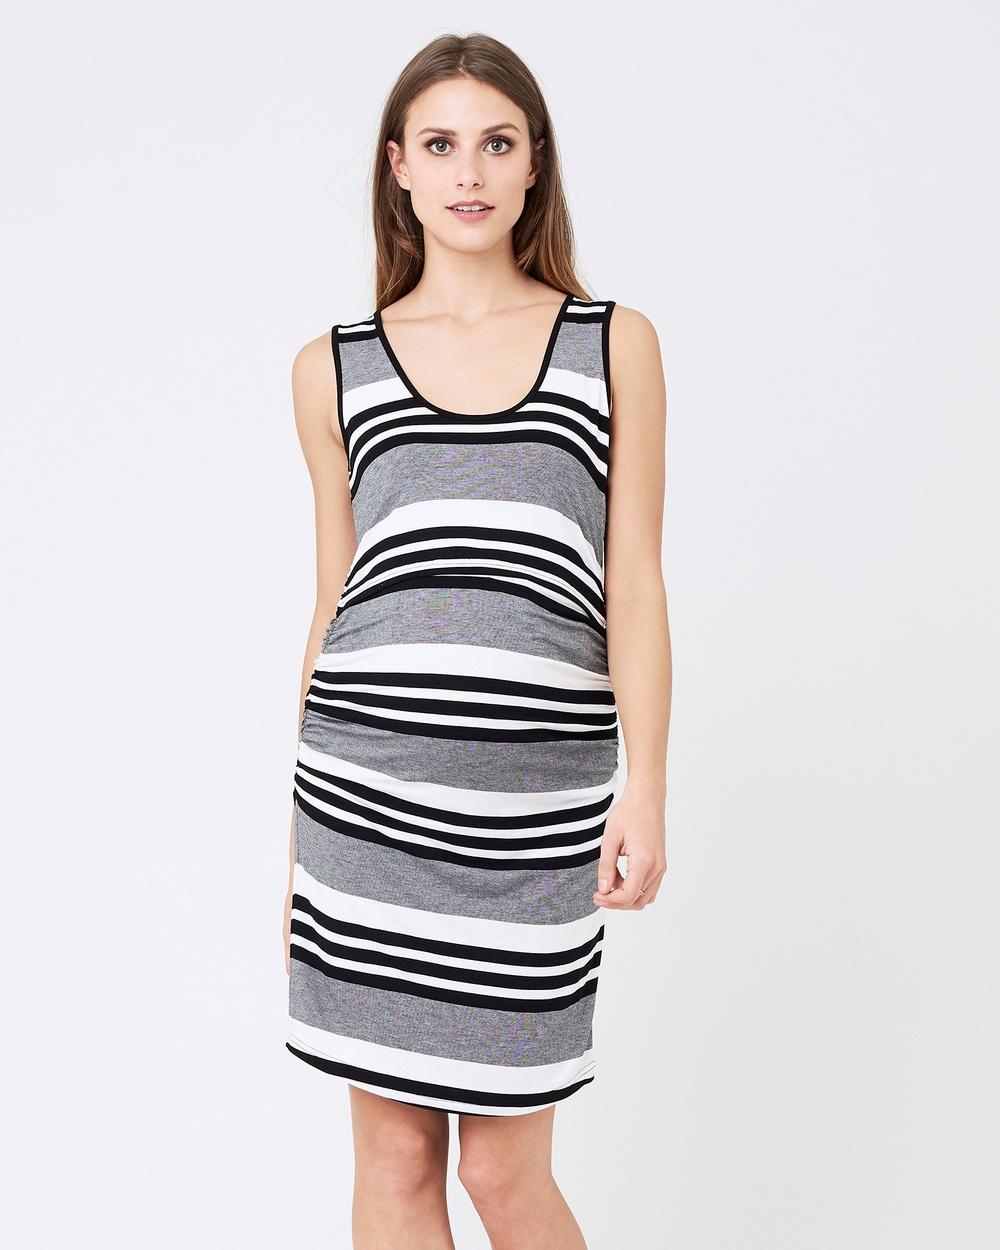 Ripe Maternity Stripe Nursing Dress Bodycon Dresses Black-White Stripe Nursing Dress